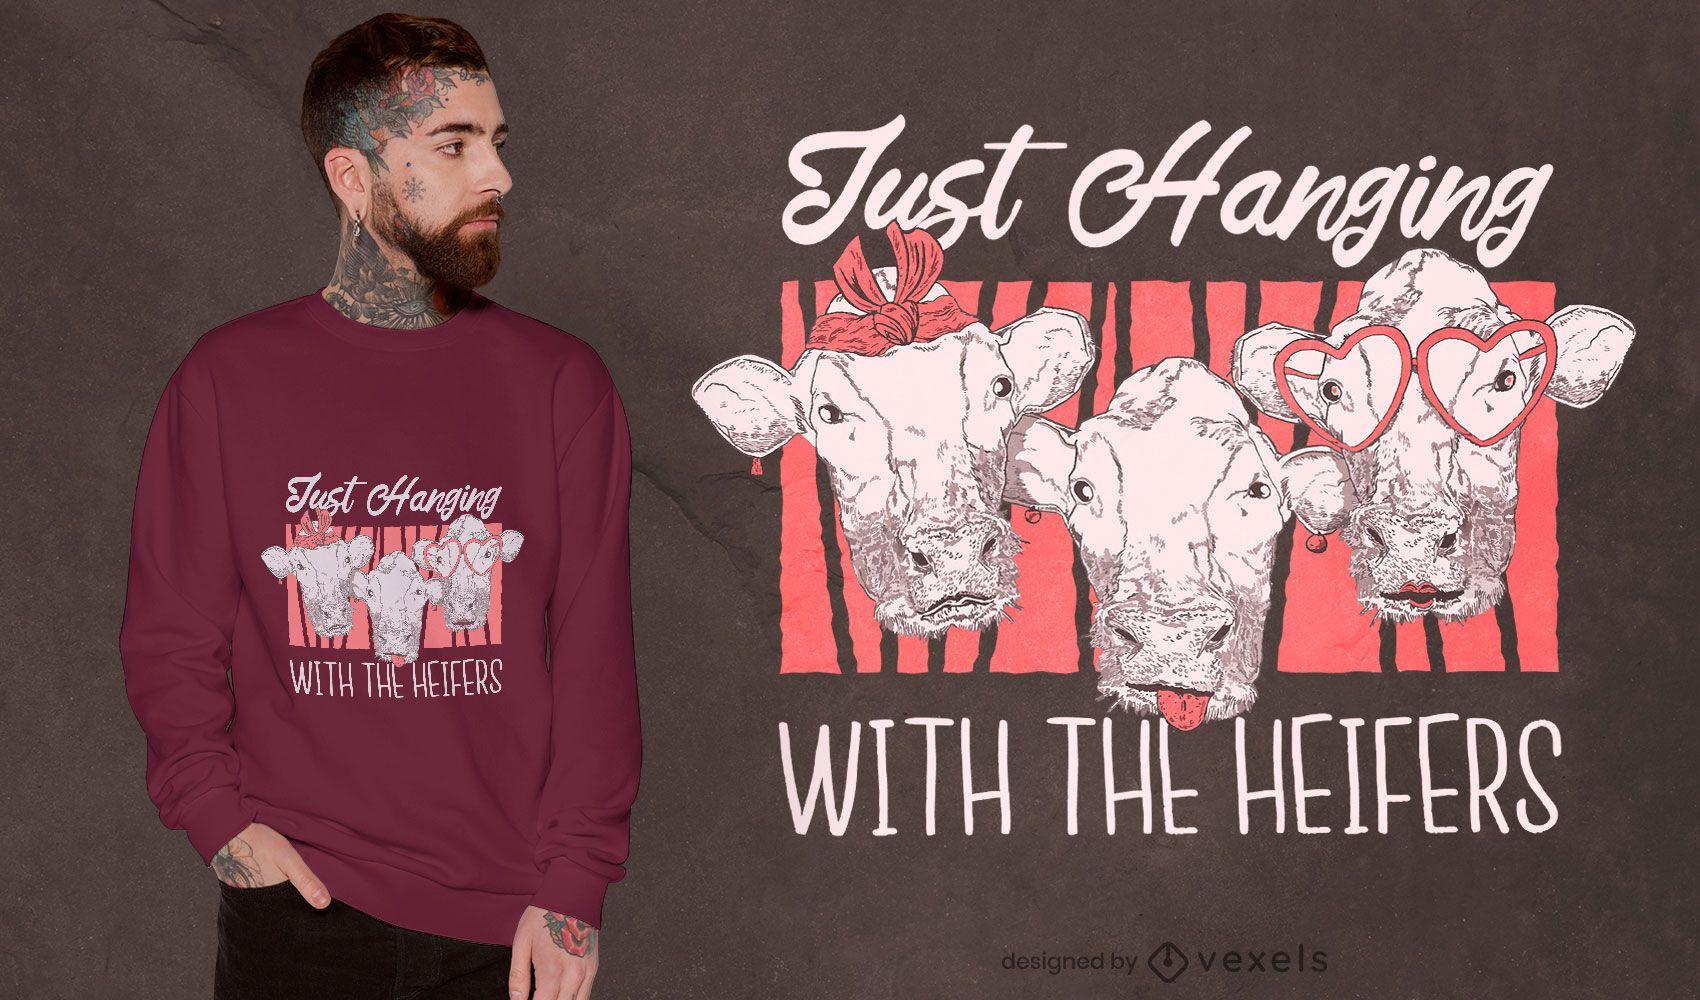 Heifer quote t-shirt design